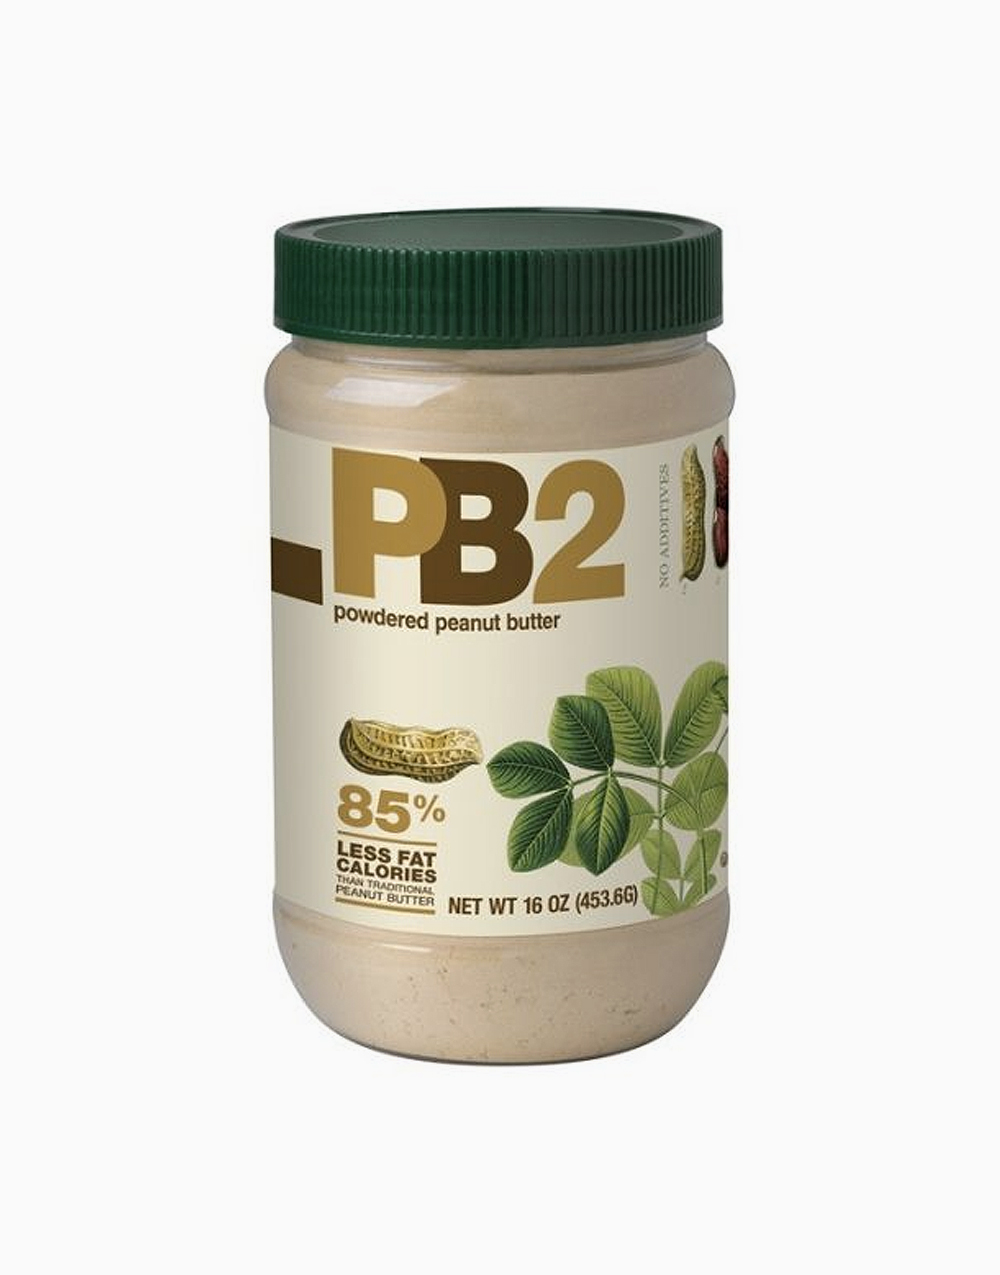 Powdered Peanut Butter (16oz) by PB2